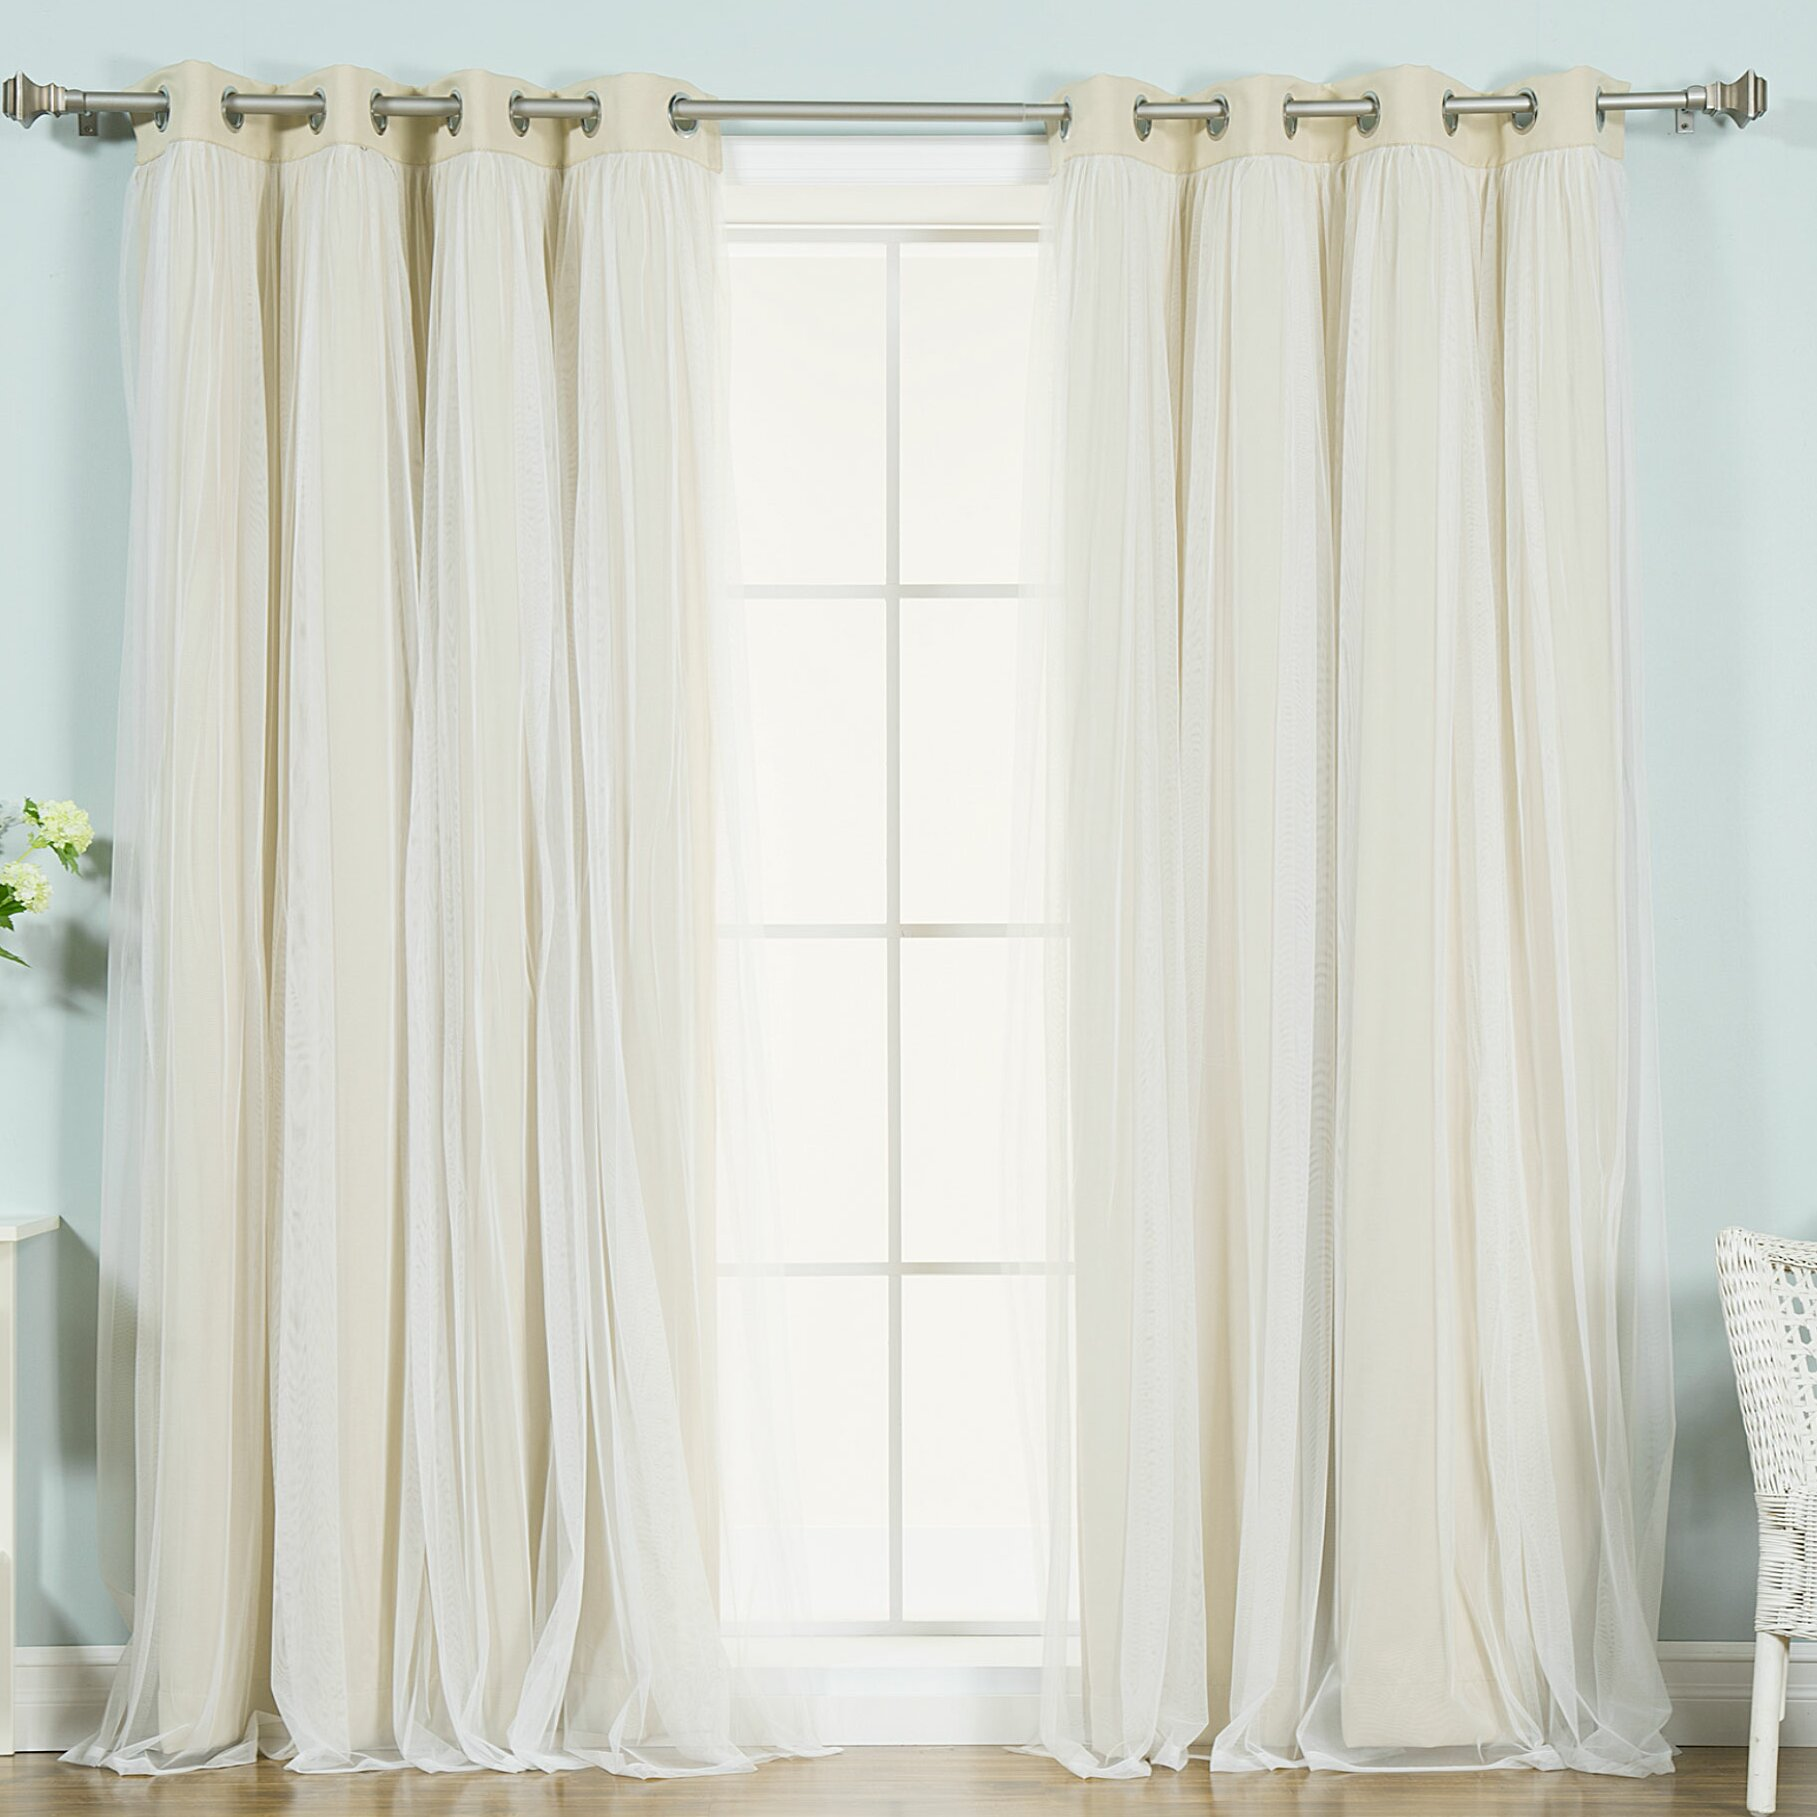 Window Treatments Curtains & Drapes Best Home Fashion, Inc. SKU ...